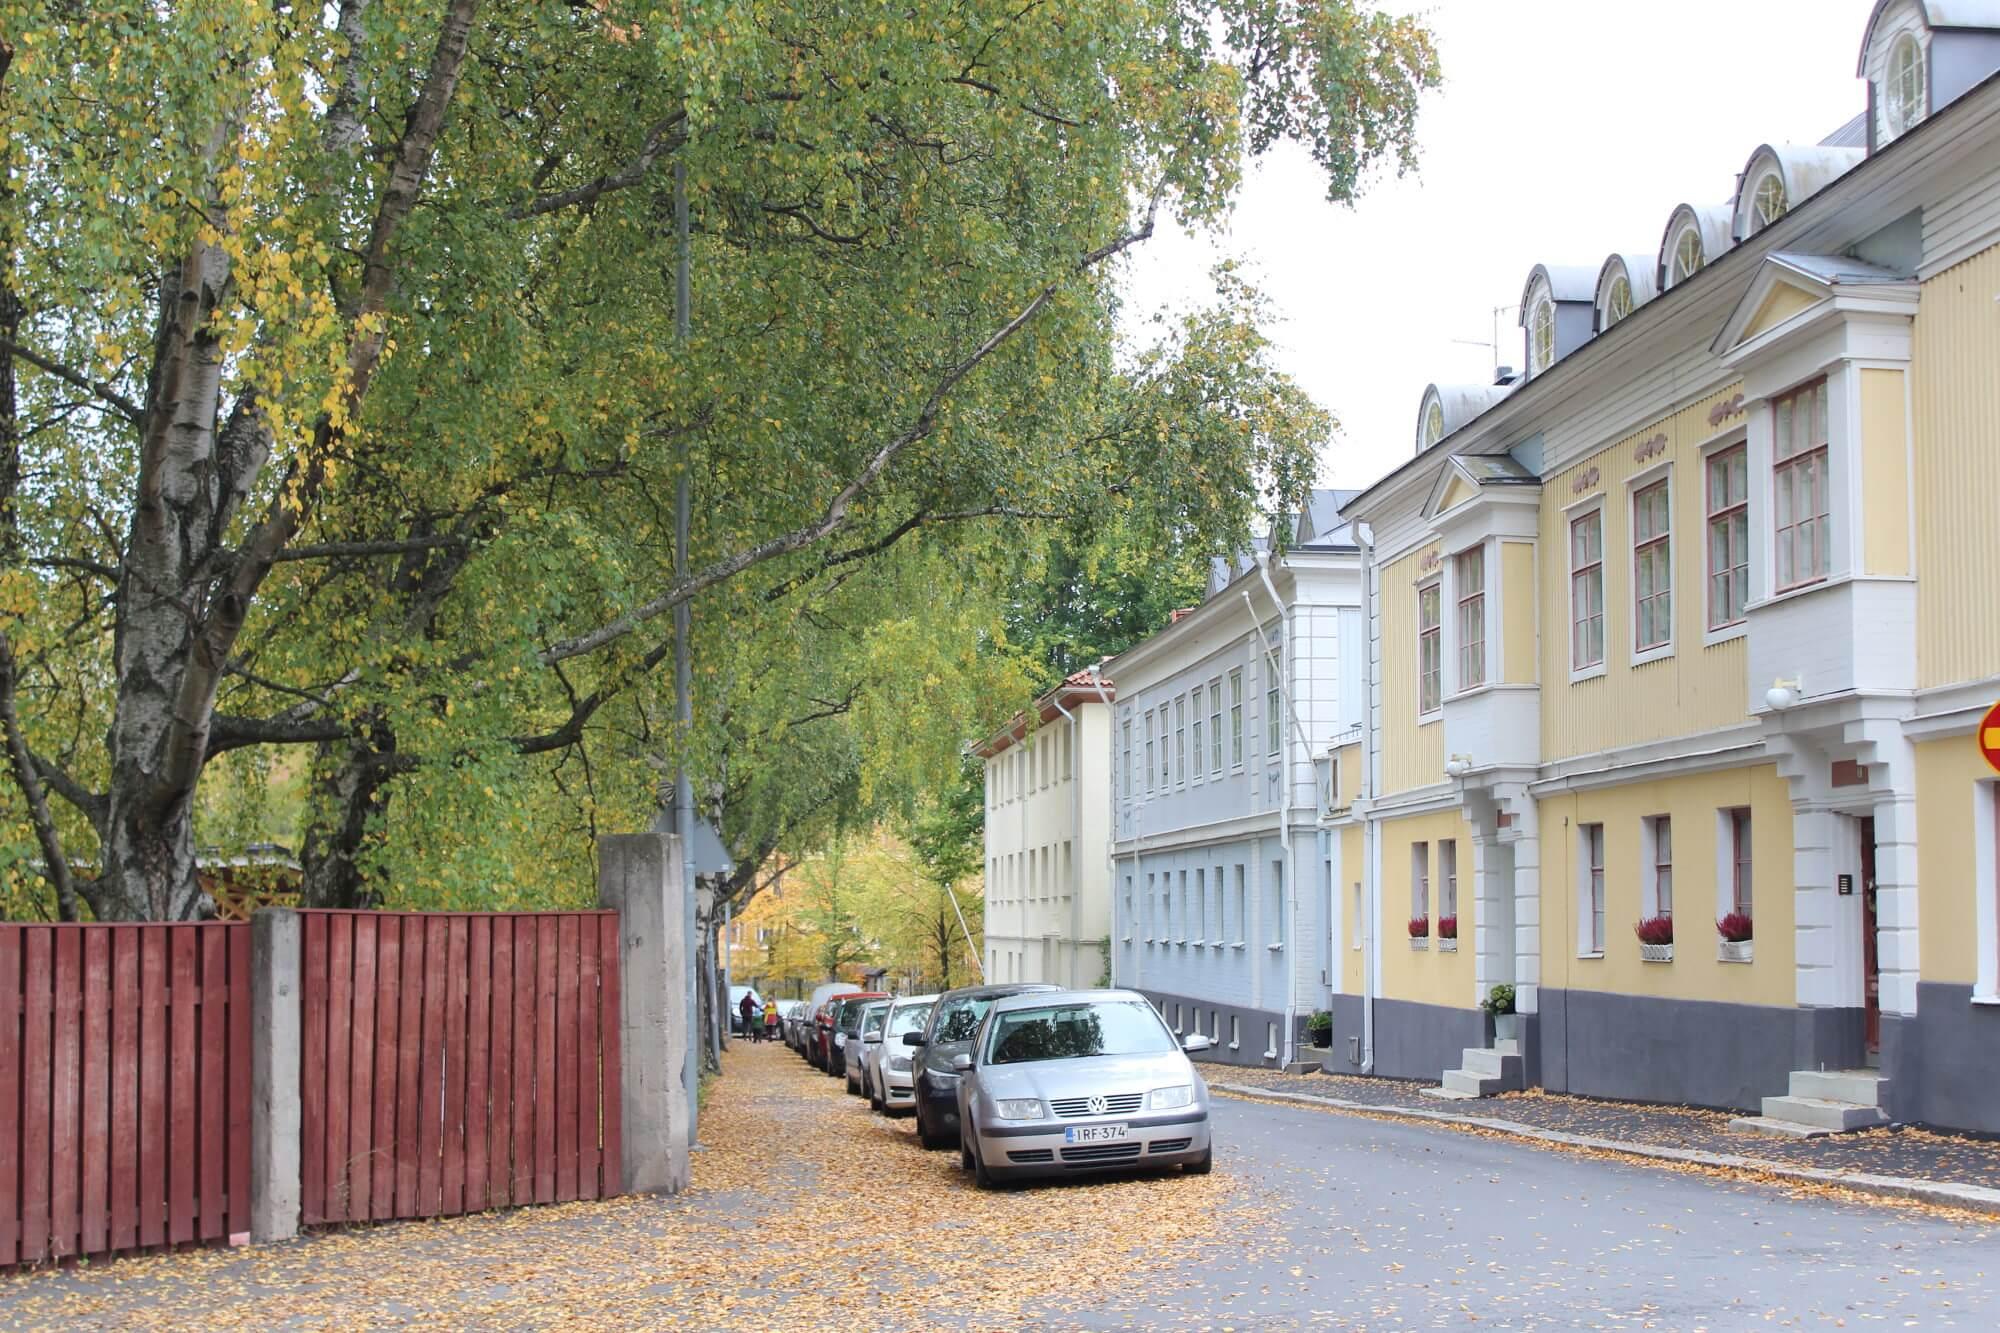 Herbst-Freude: buntes Laub